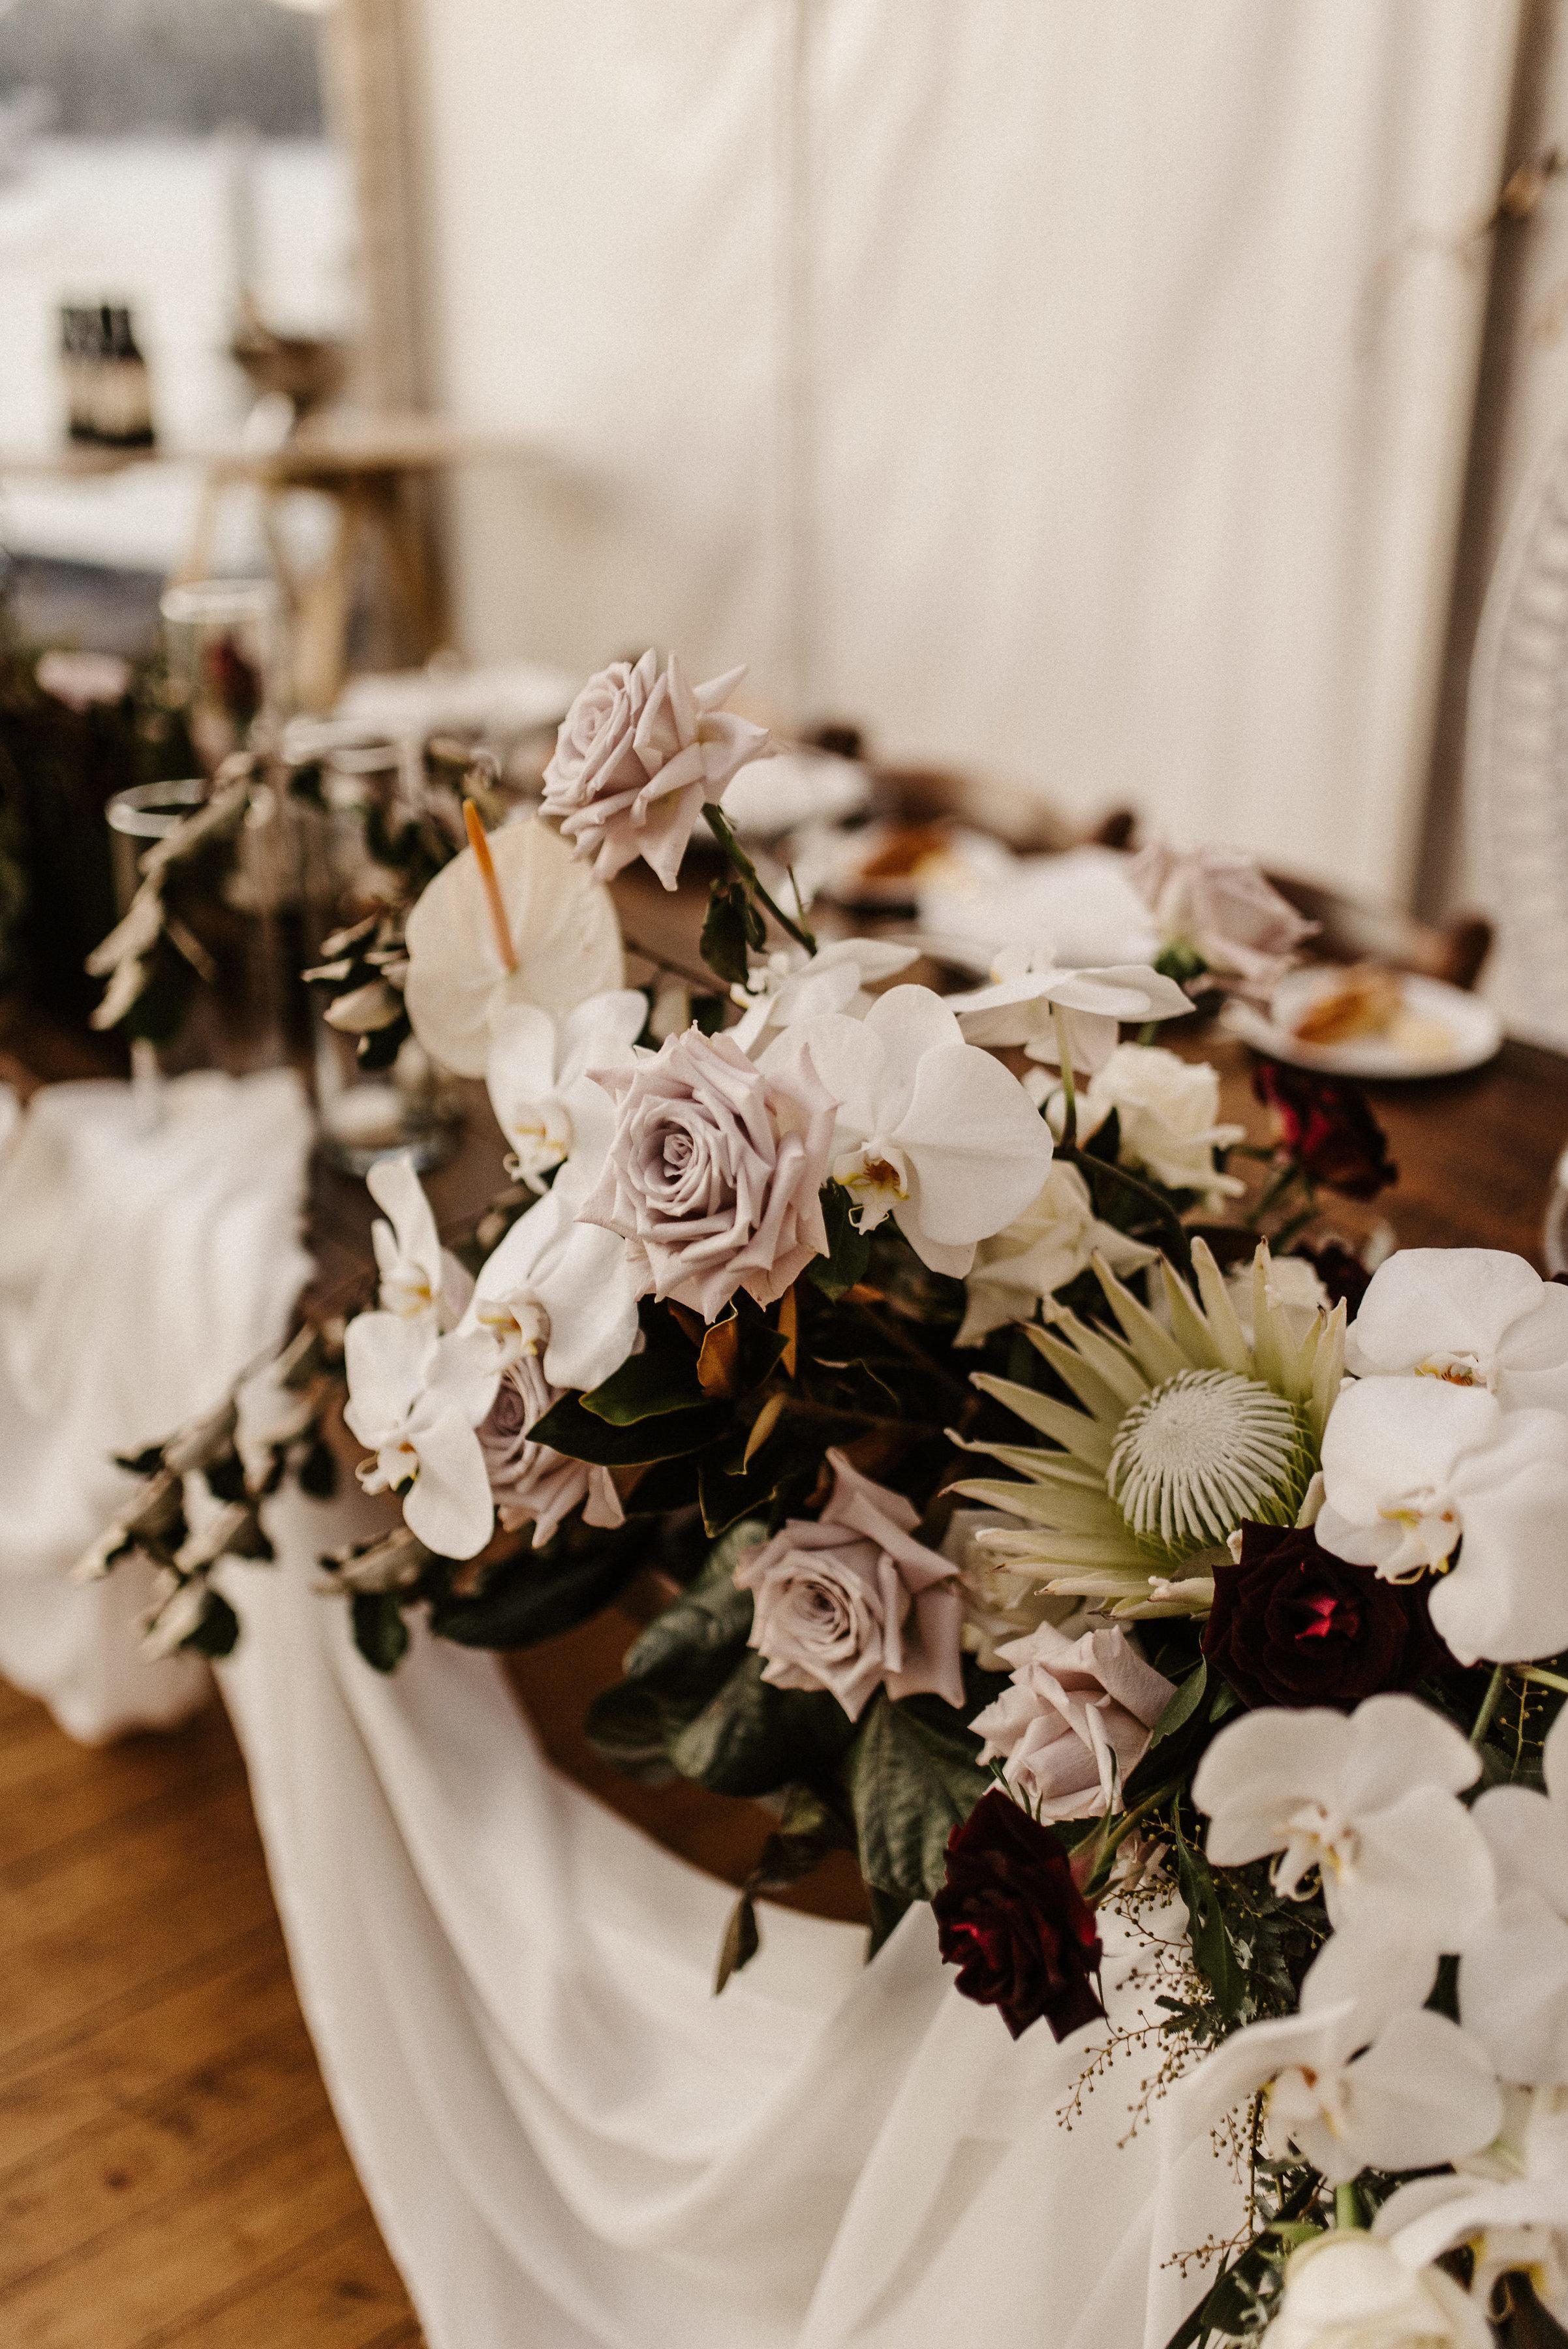 Tess + Greg Native bohemian Luxe Floral arrangements